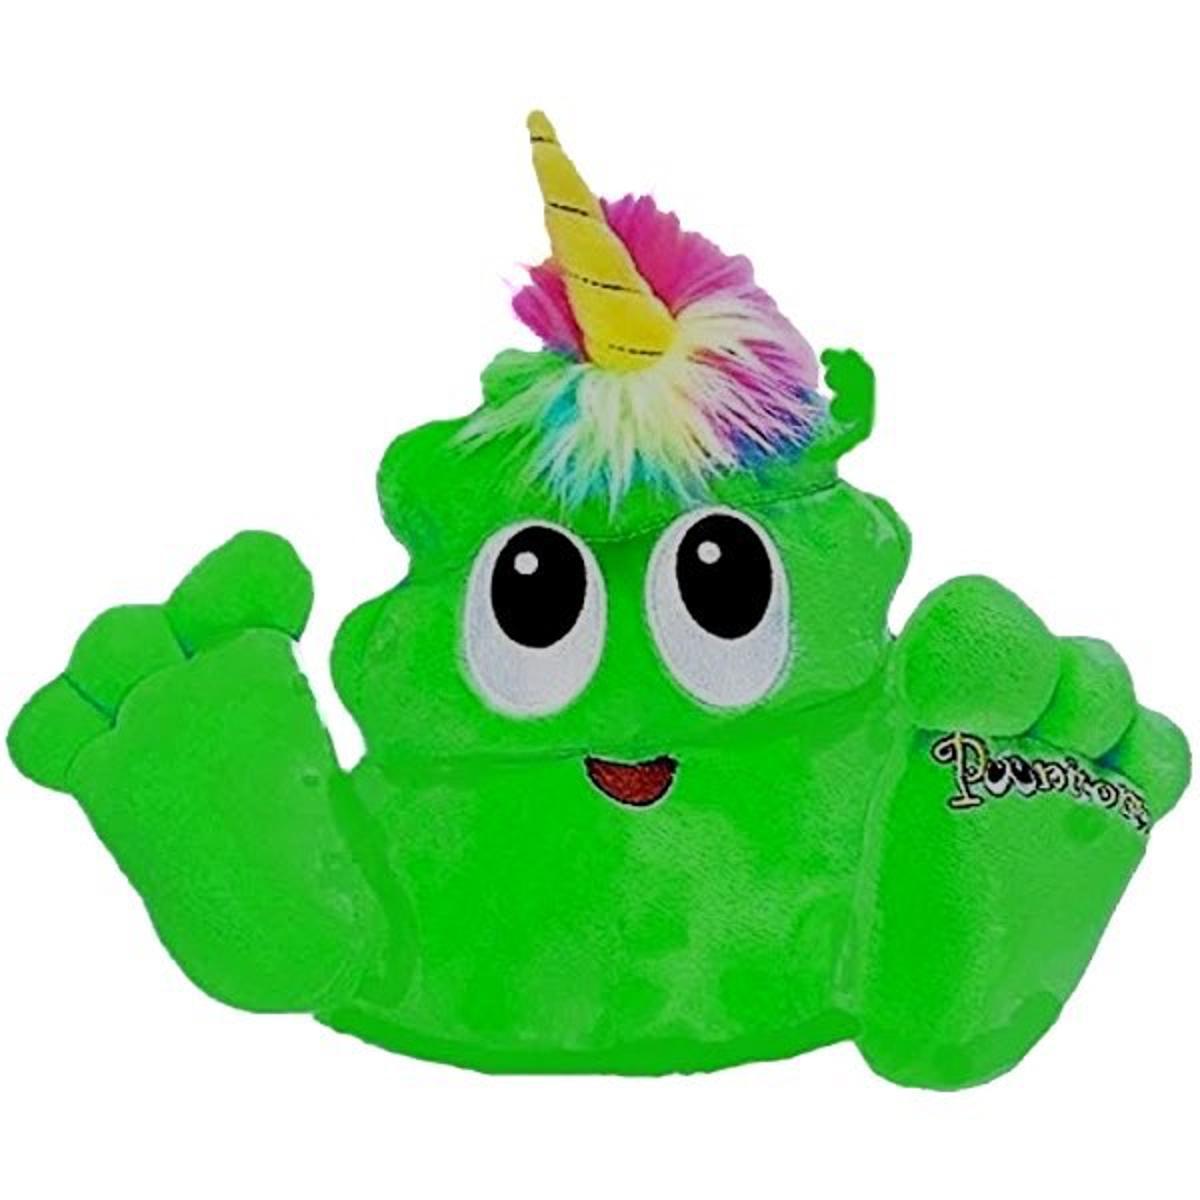 Poonicorn Plush Green